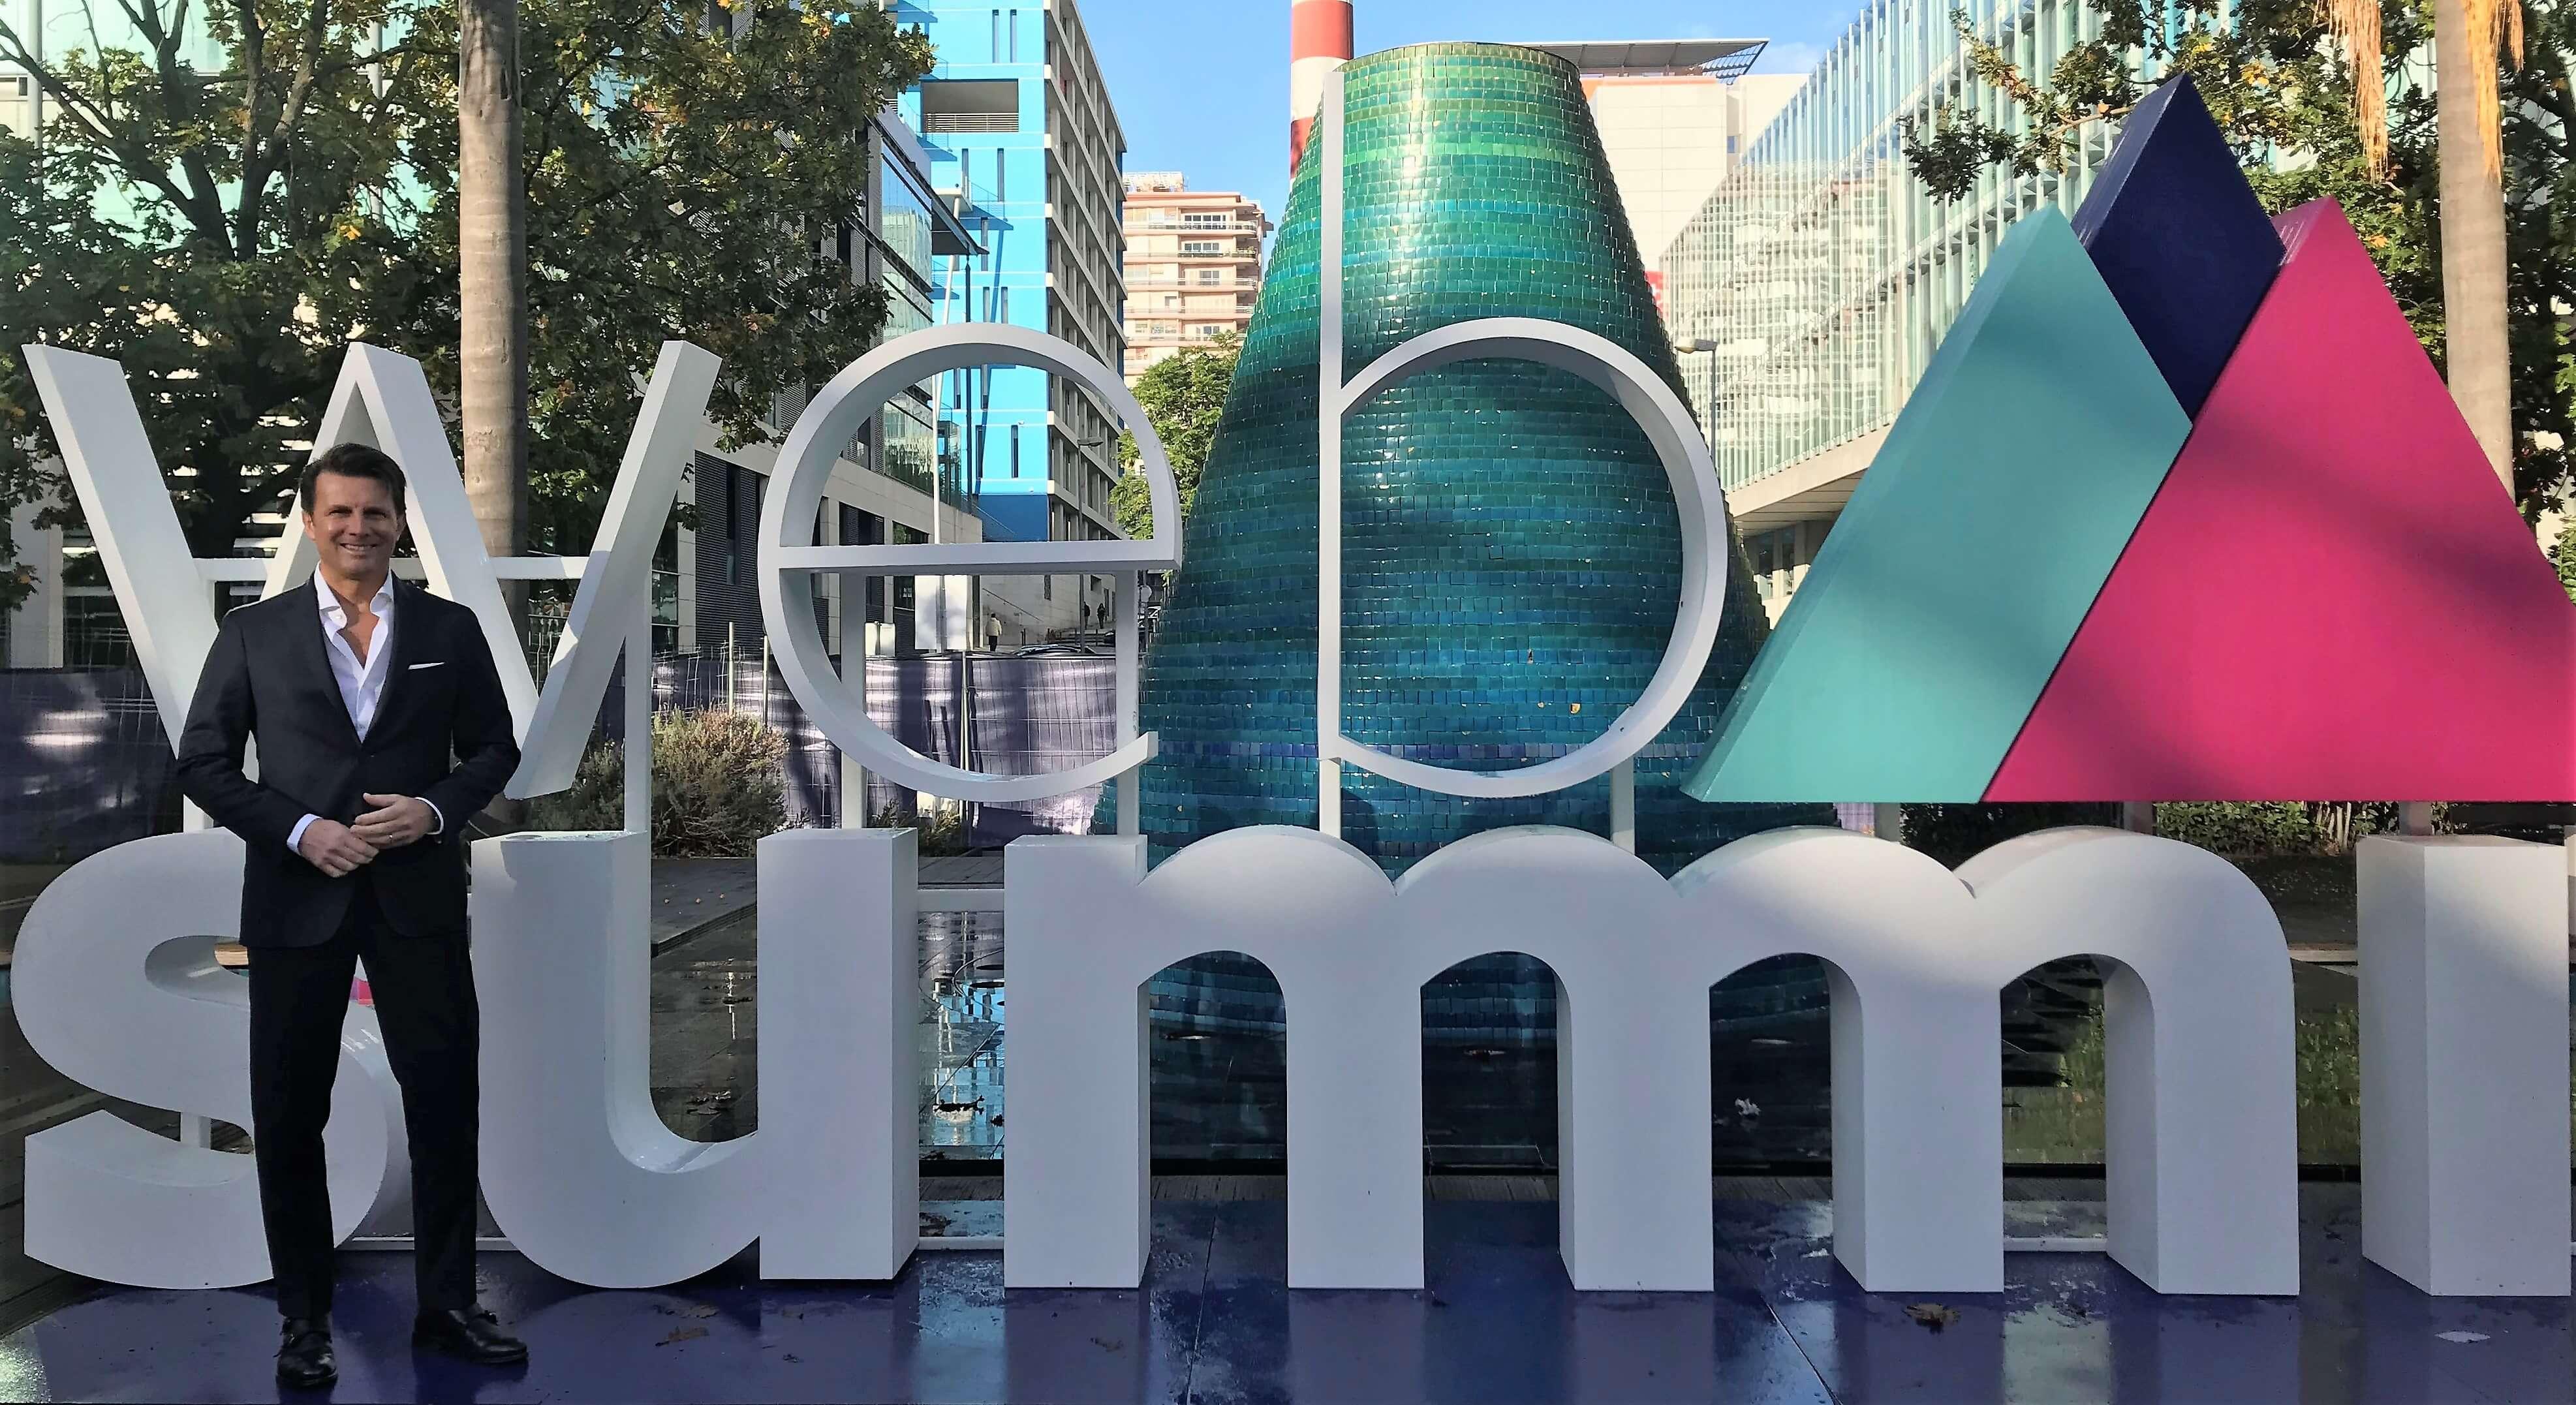 Web Summit 2018: Interview with Fabio Tessera